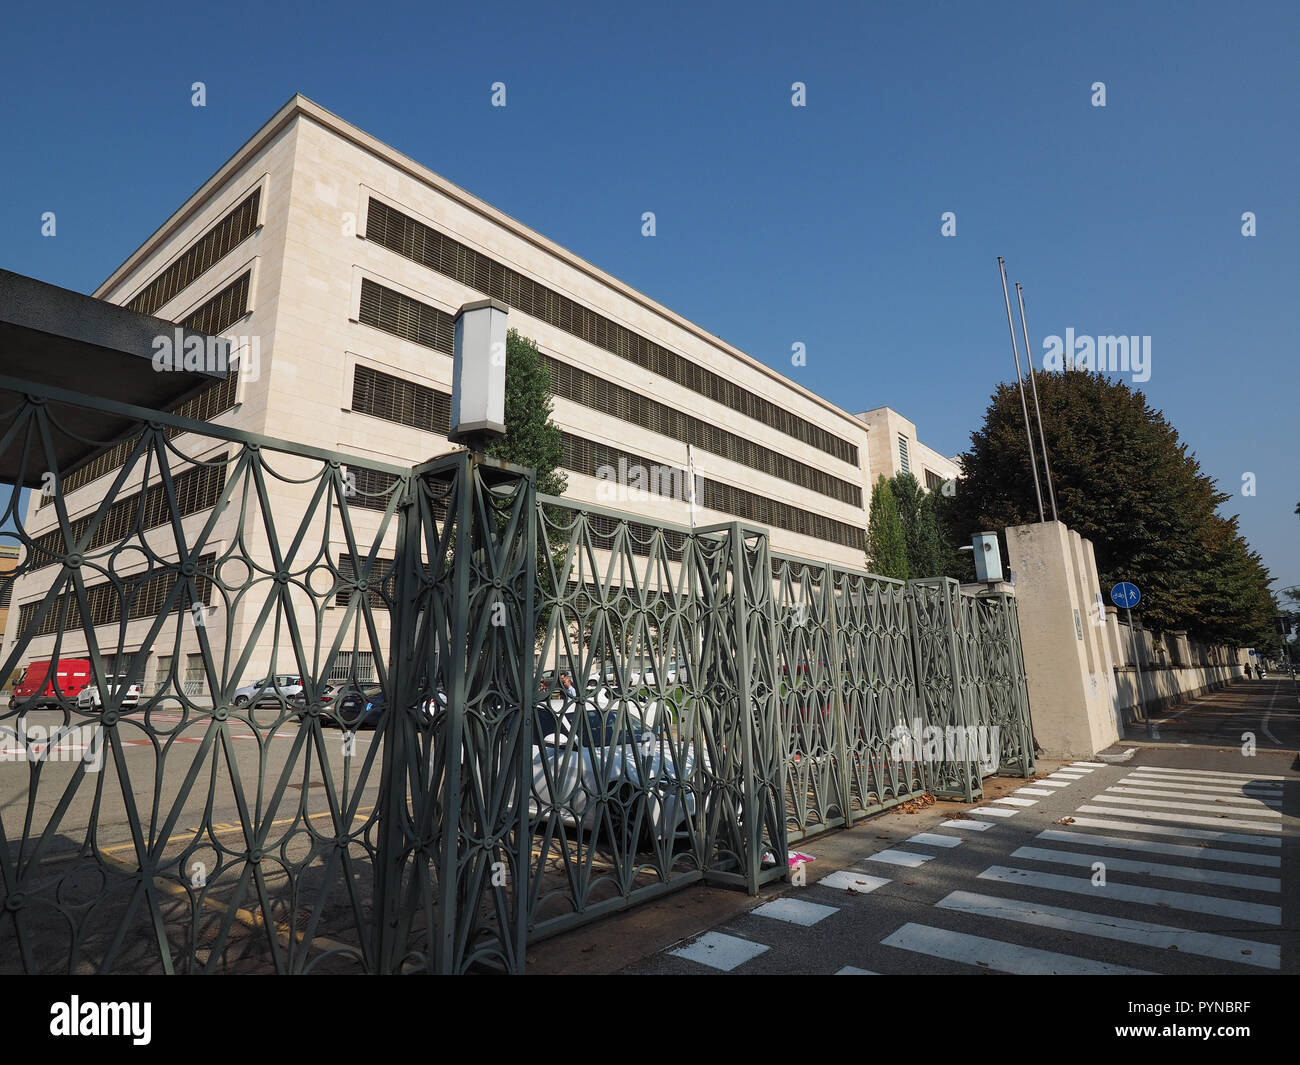 TURIN, ITALY - CIRCA SEPTEMBER 2018: Fiat Chrysler Automobiles (FCA) Mirafiori car factory for Fiat, Lancia, Alfa Romeo, Jeep and Abarth brands - Stock Image